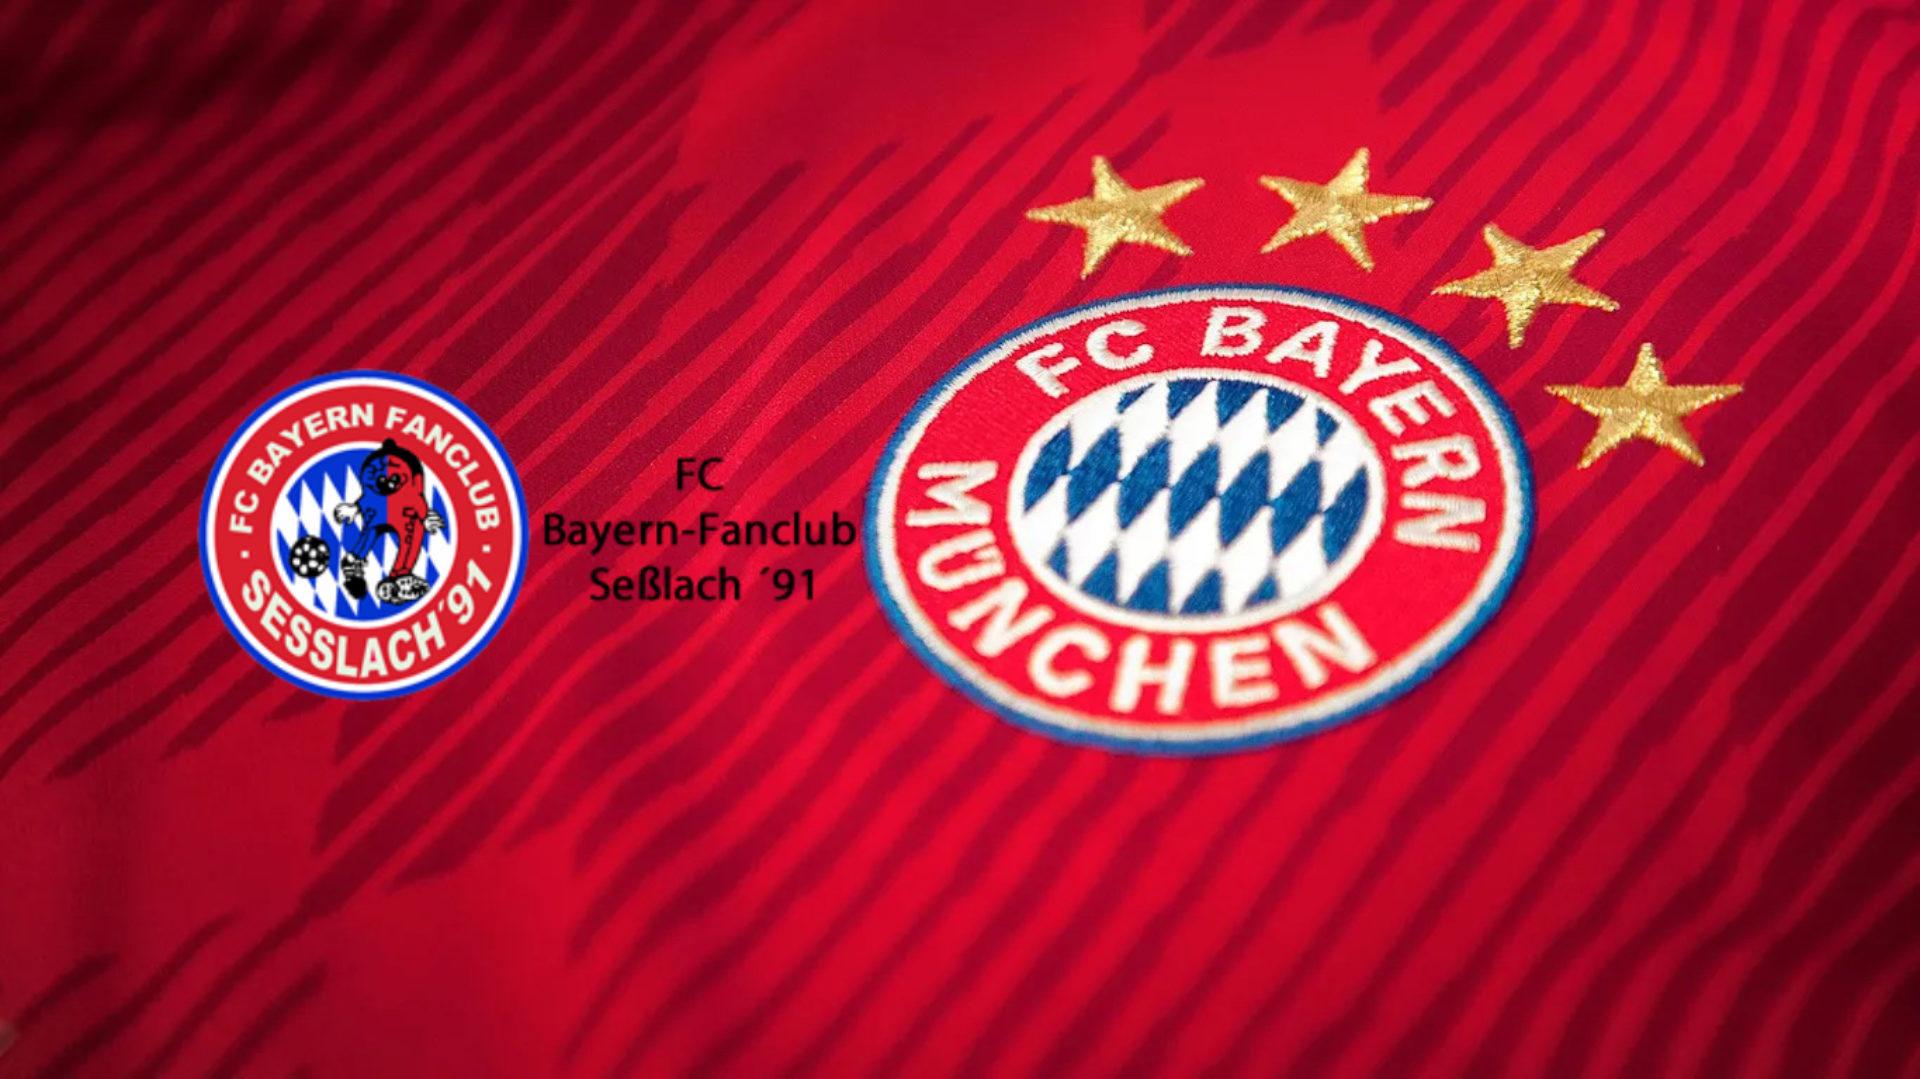 FCB Sesslach91